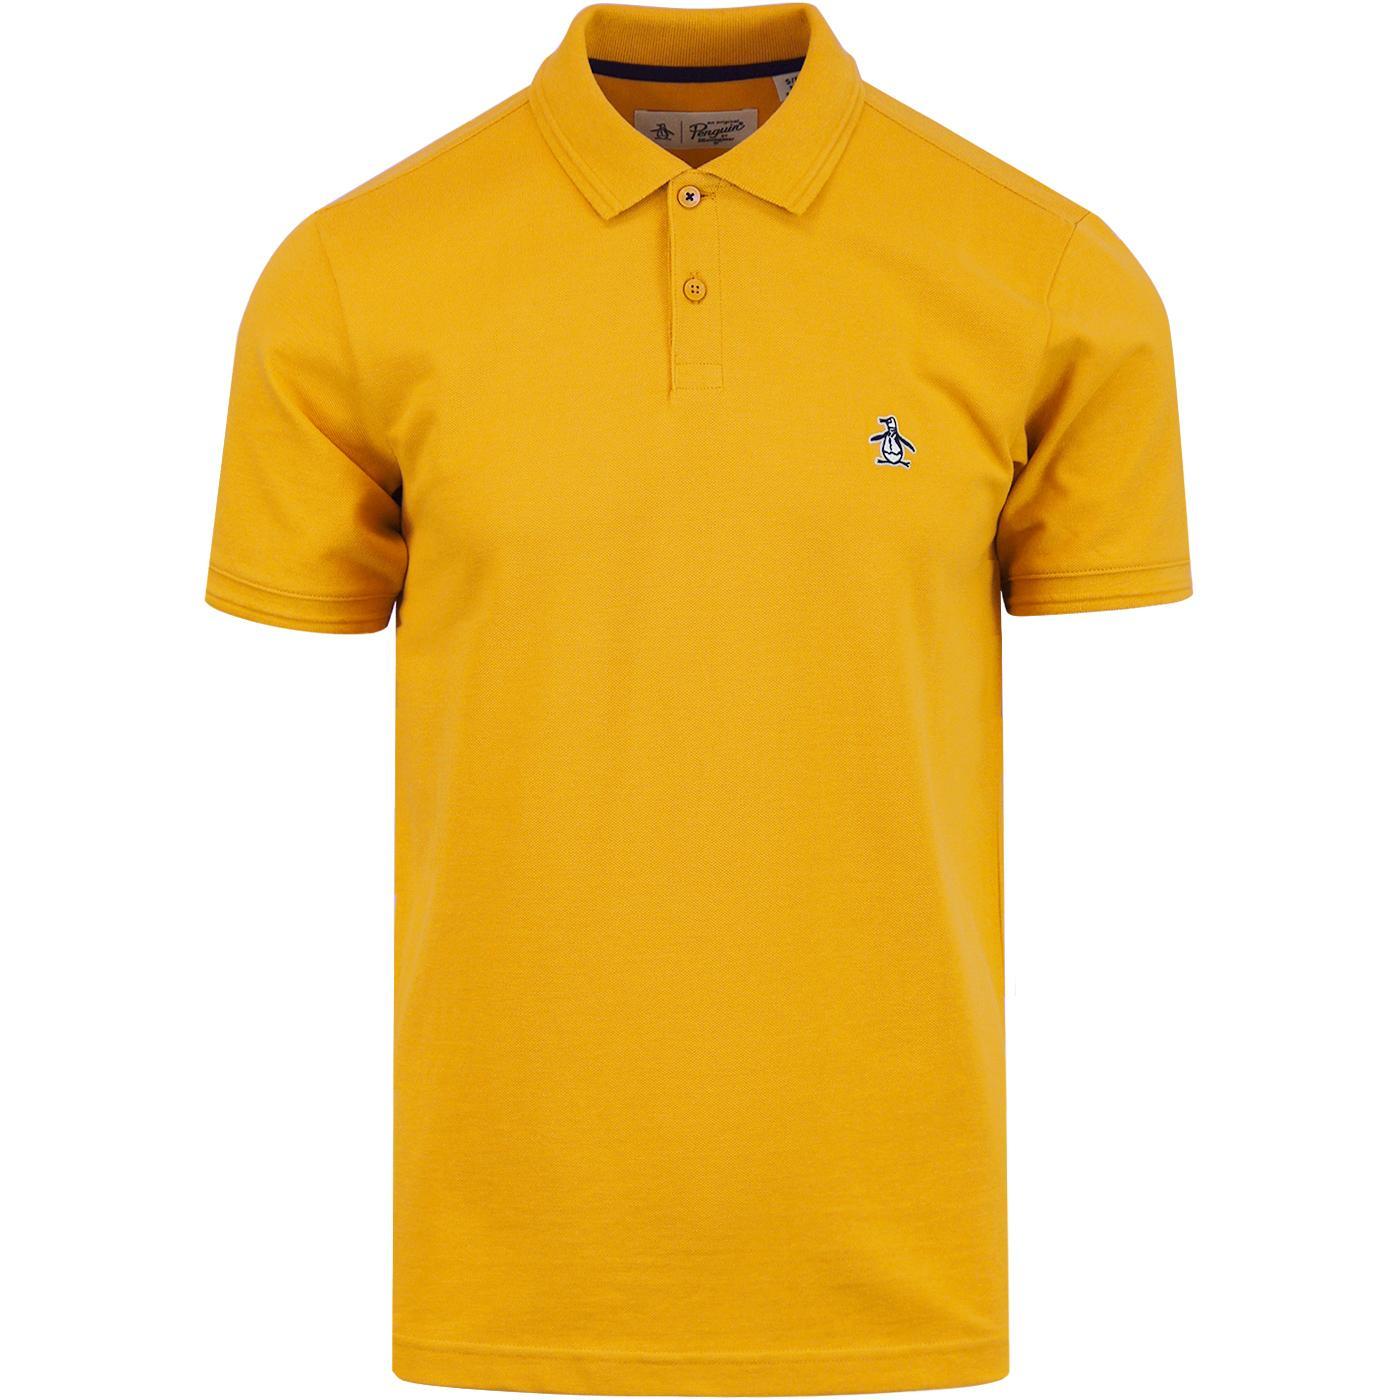 ORIGINAL PENGUIN Raised Rib Pique Polo Shirt HG